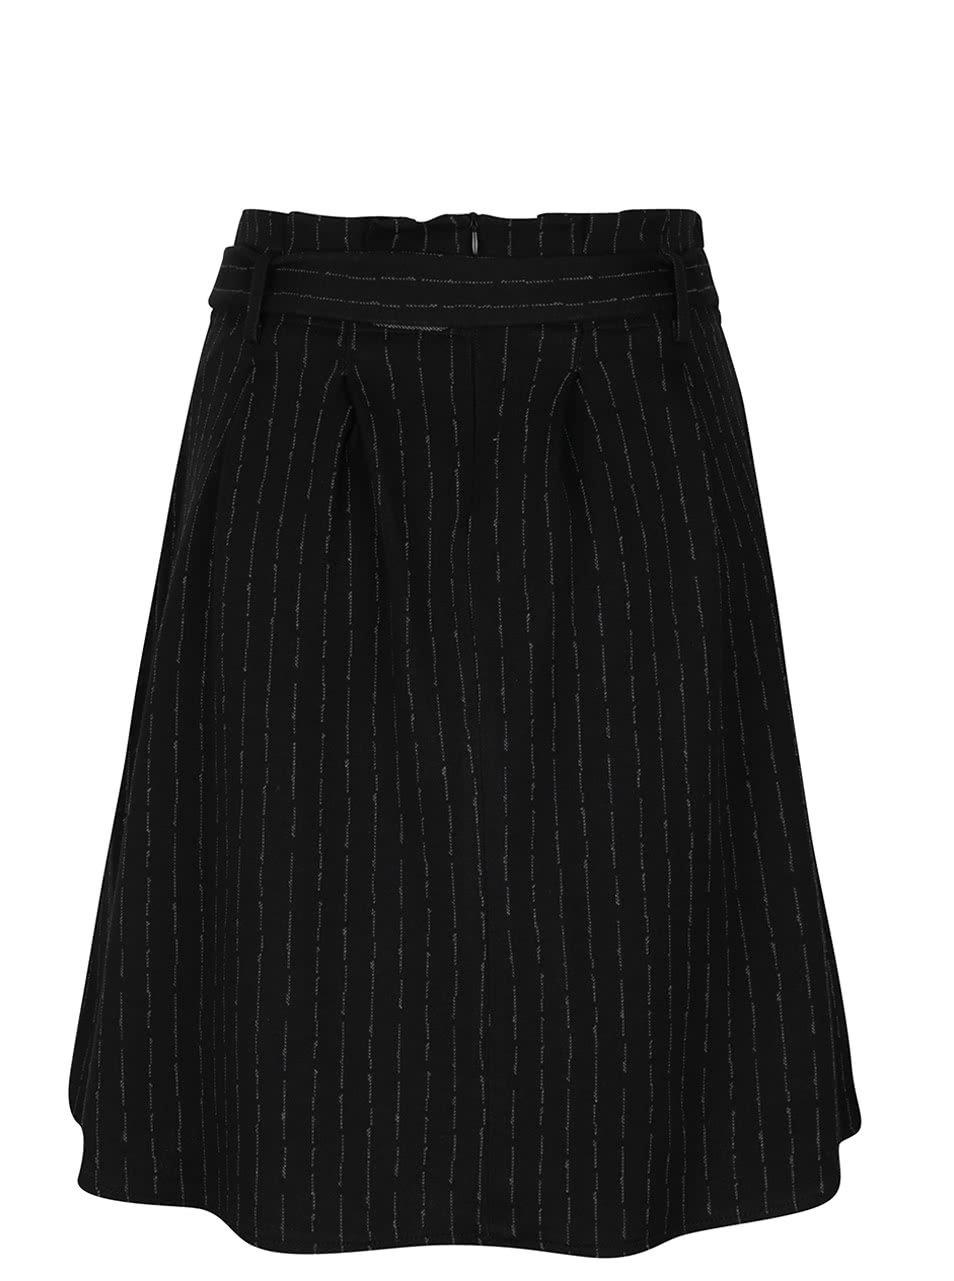 Černá vzorovaná sukně se sklady Alchymi Robin ... 948974cb2e